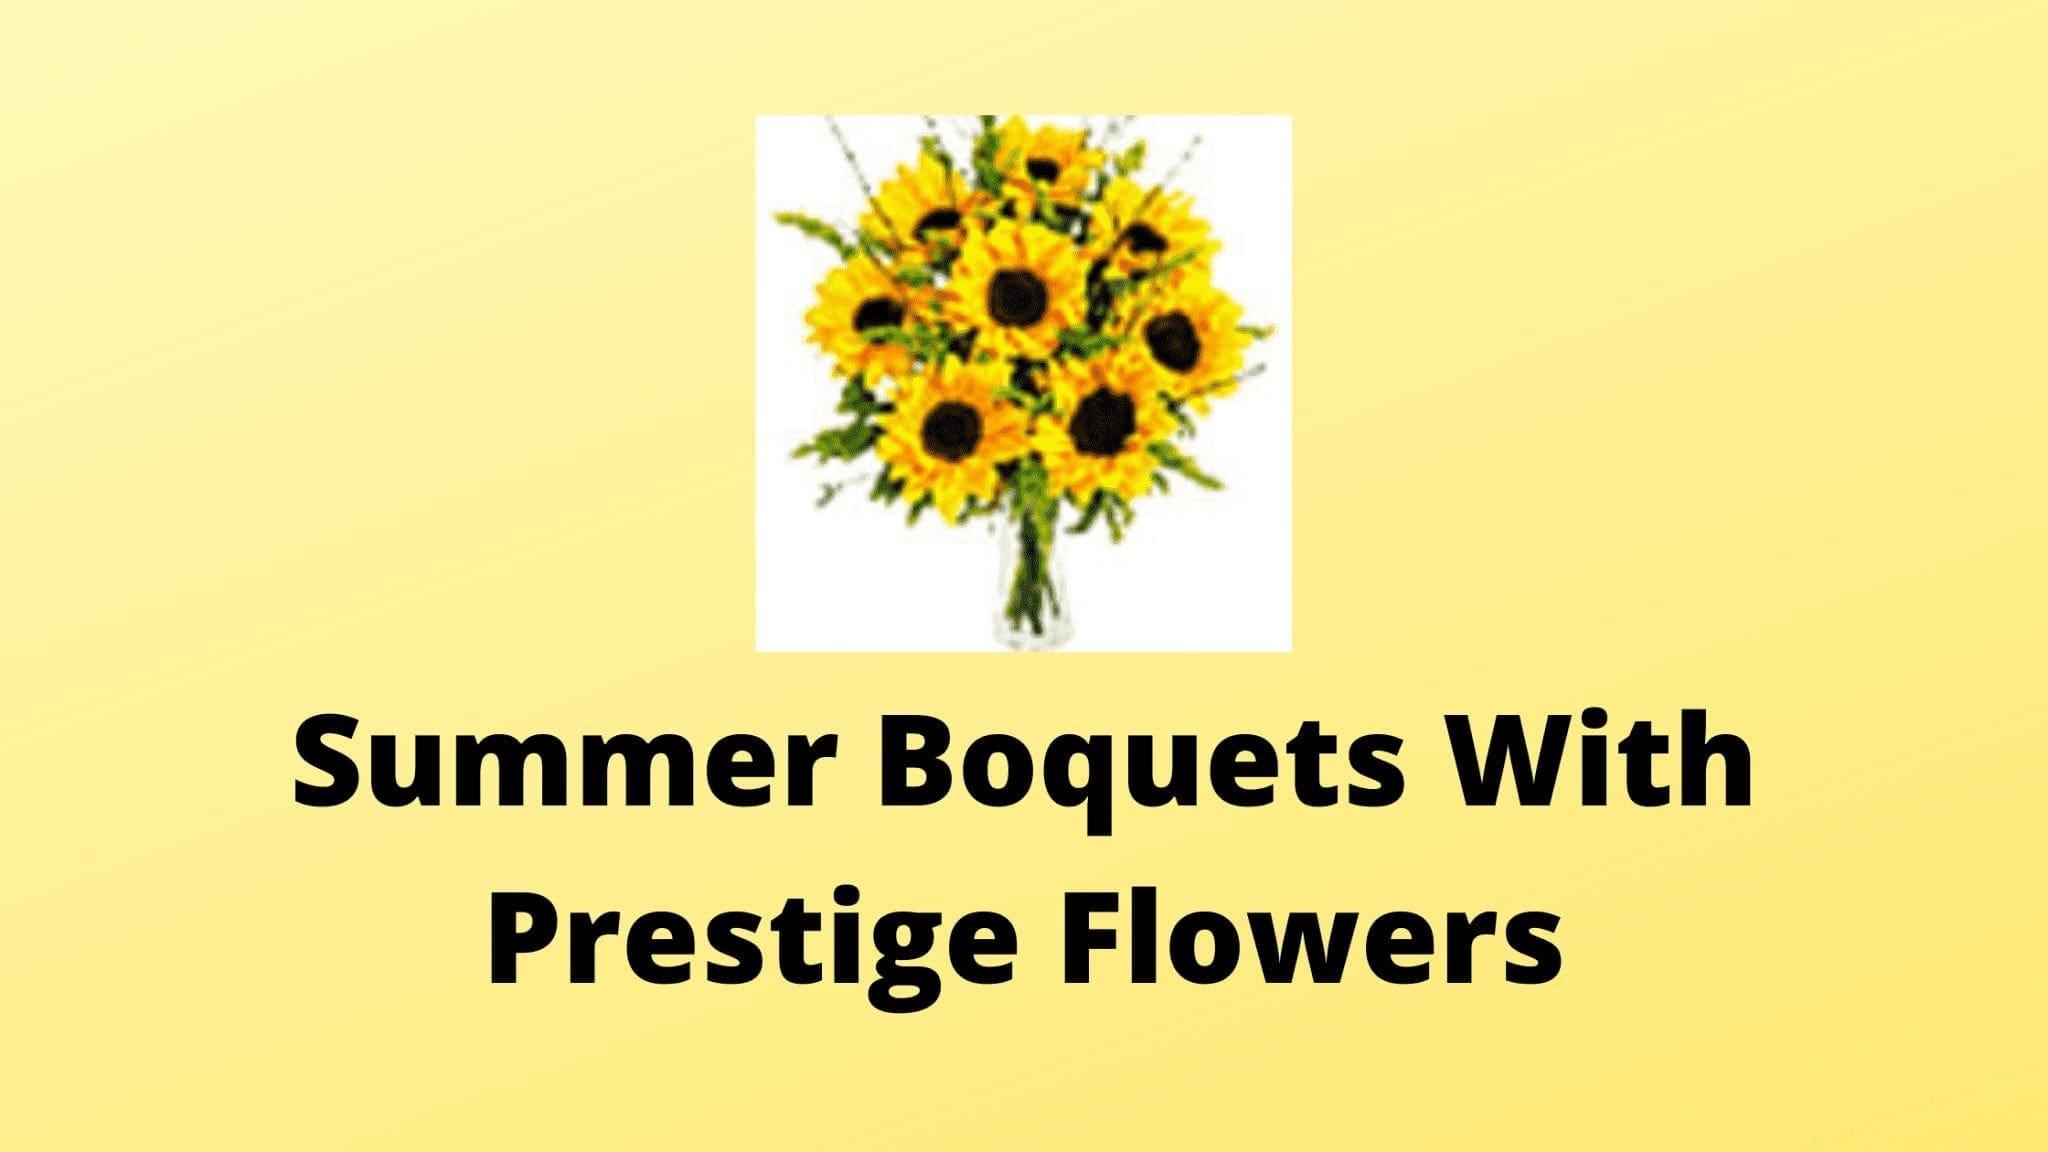 Summer Boquets With Prestige Flowers